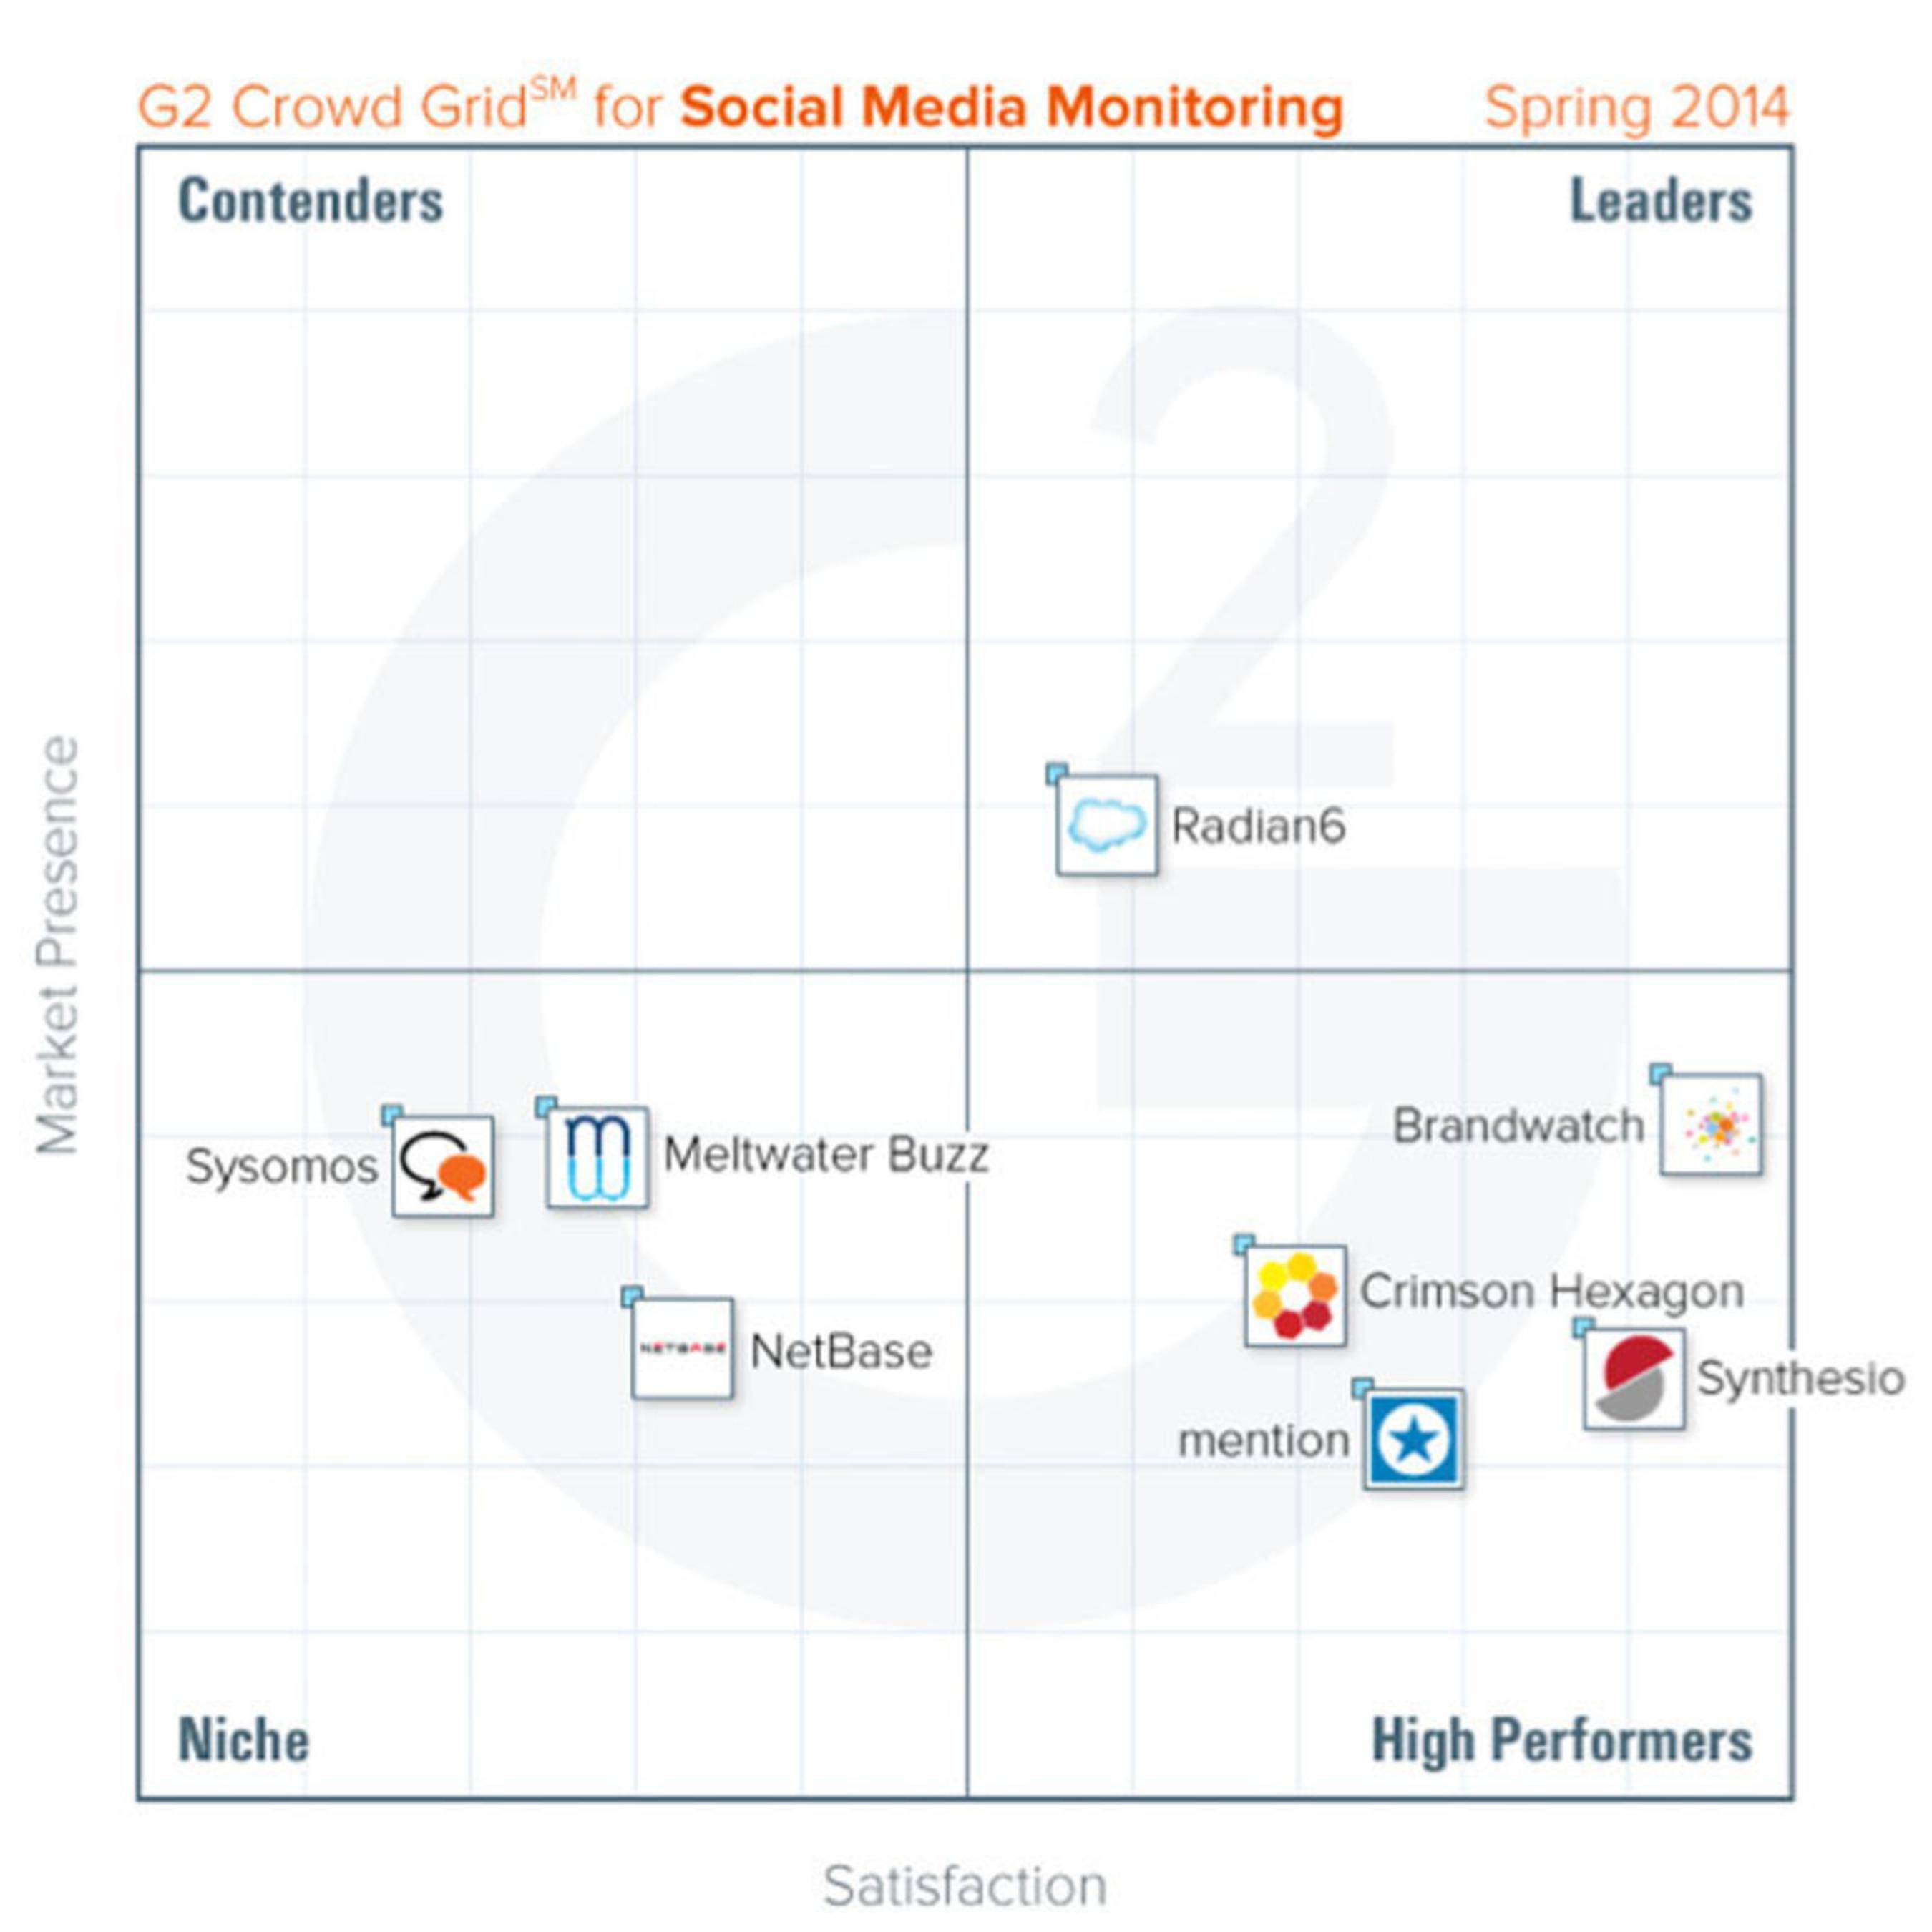 G2 Crowd Grid for Social Media Monitoring http://www.g2crowd.com/categories/social-media-monitoring/compare. (PRNewsFoto/G2 Crowd) (PRNewsFoto/G2 CROWD)